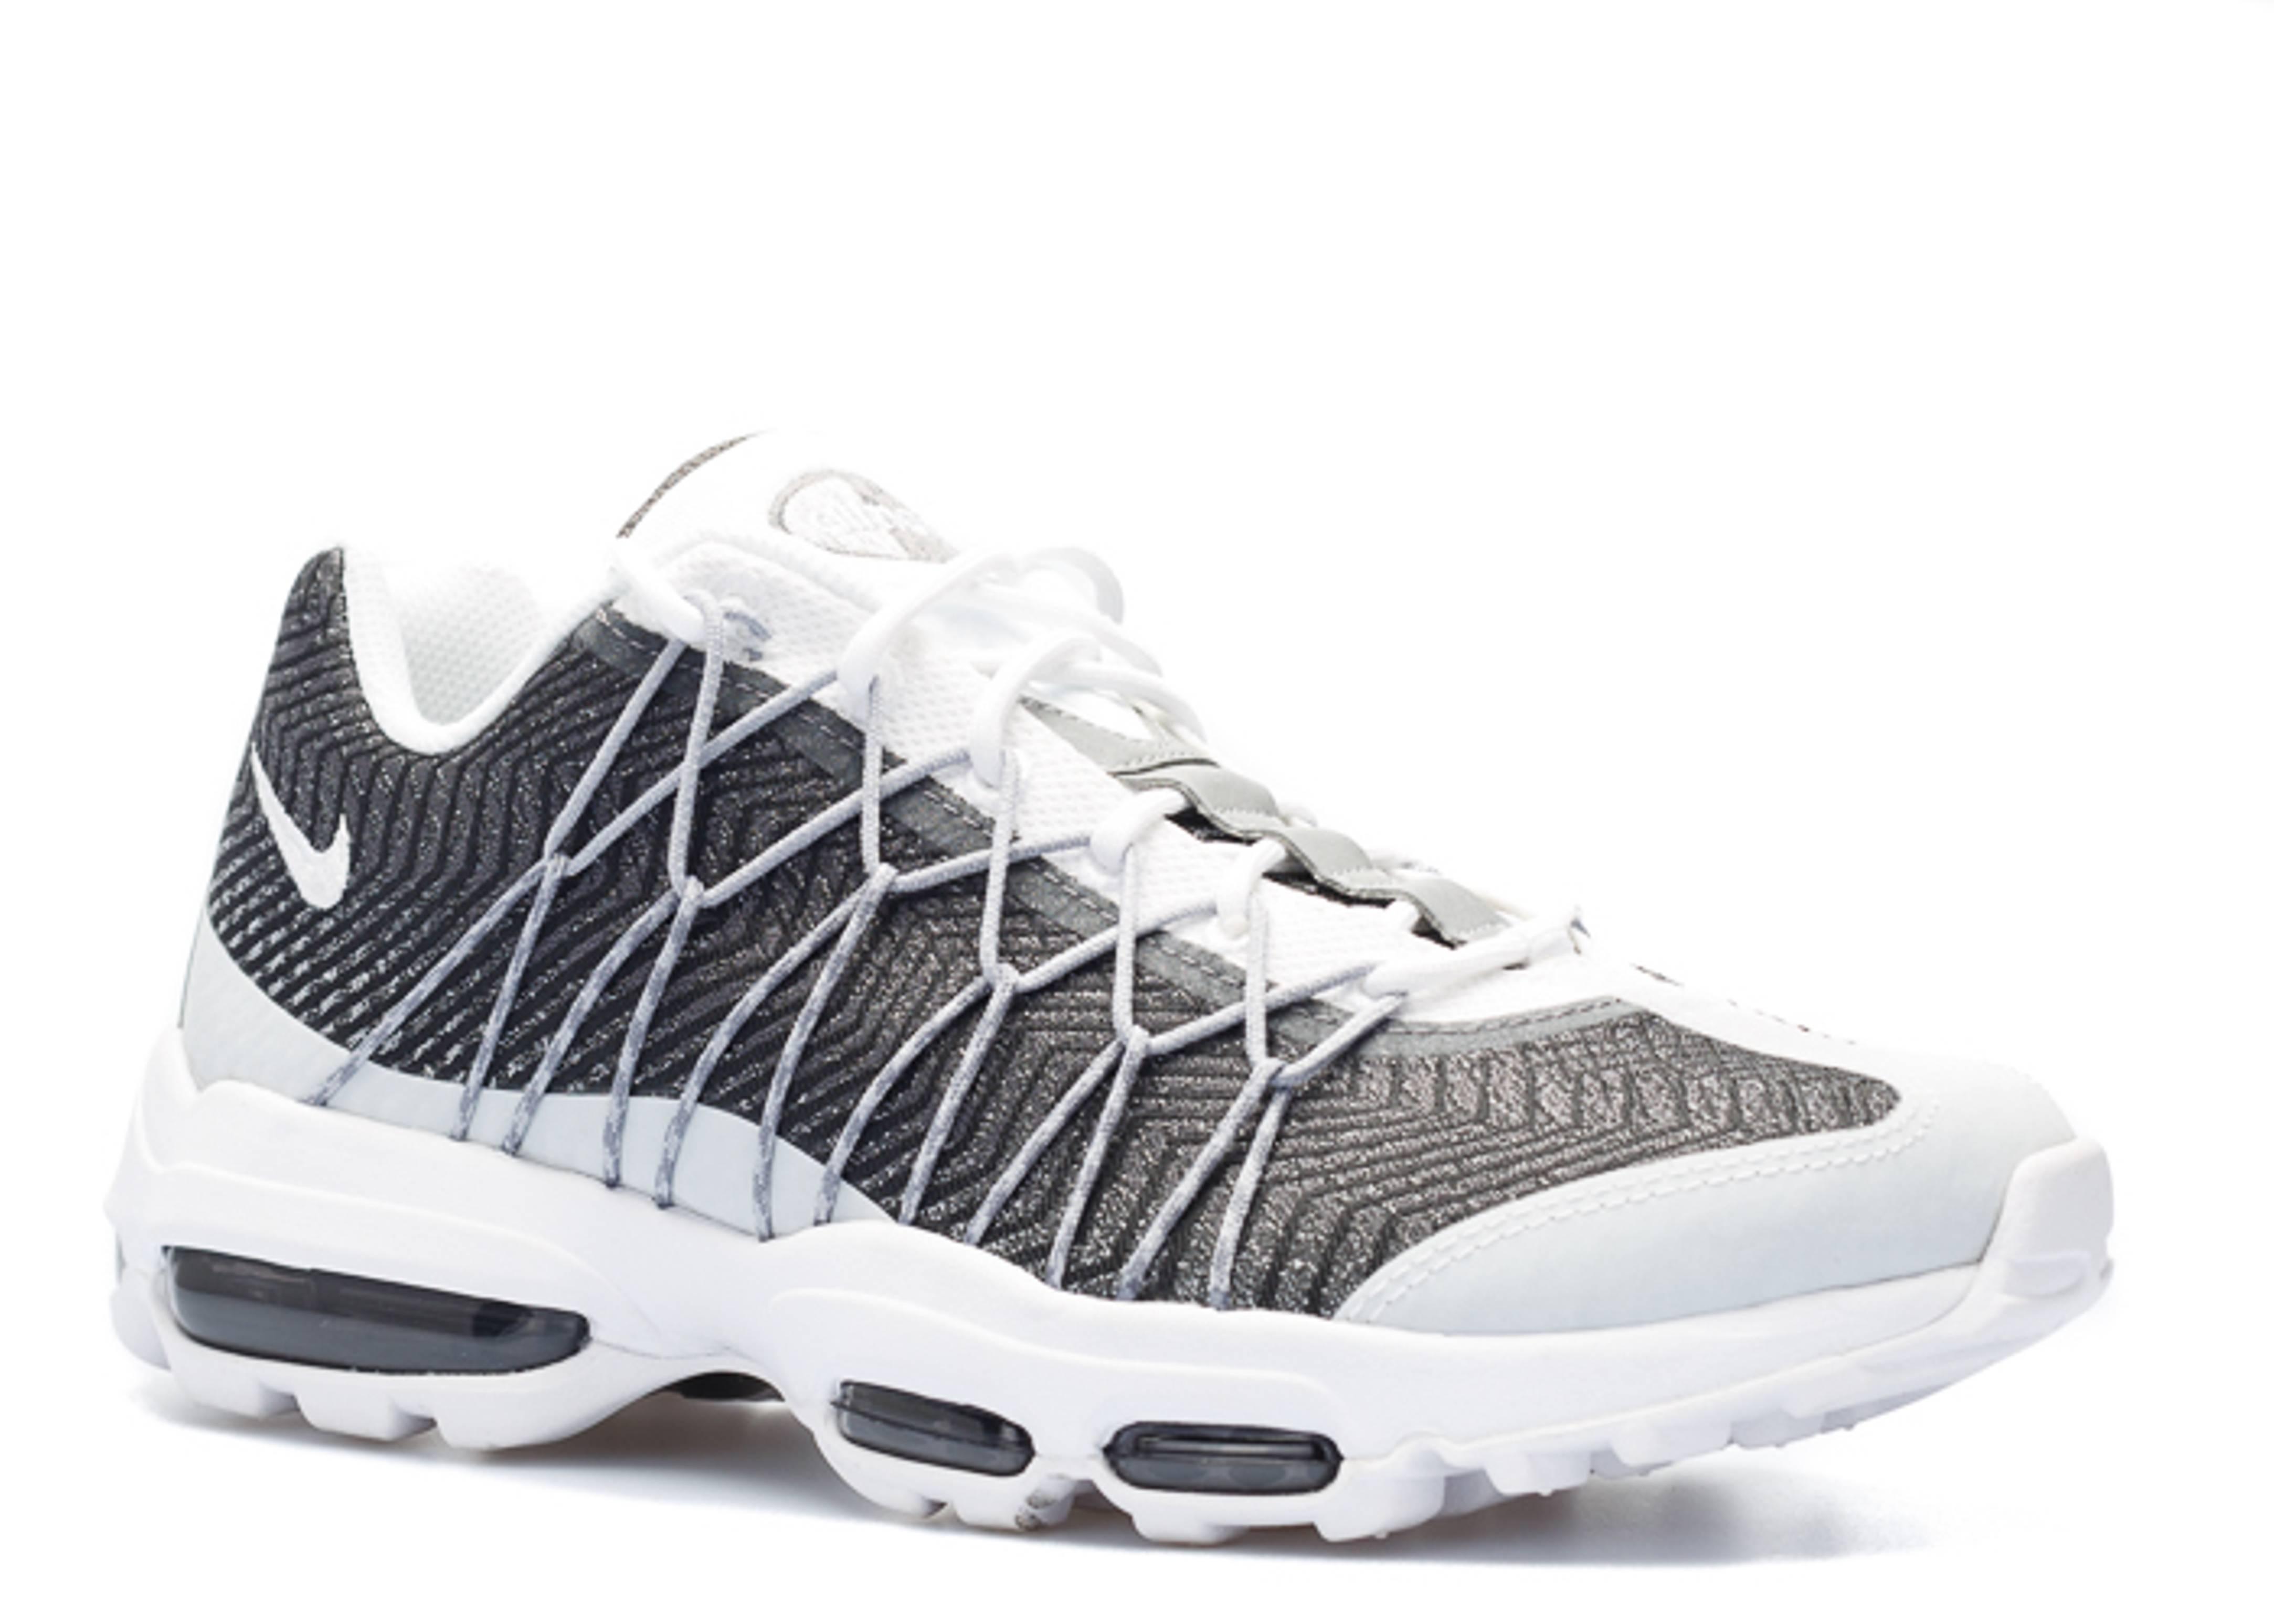 956ee96d4b789 Air Max 95 Ultra Jcrd - Nike - 749771 100 - white/white-wolf grey ...